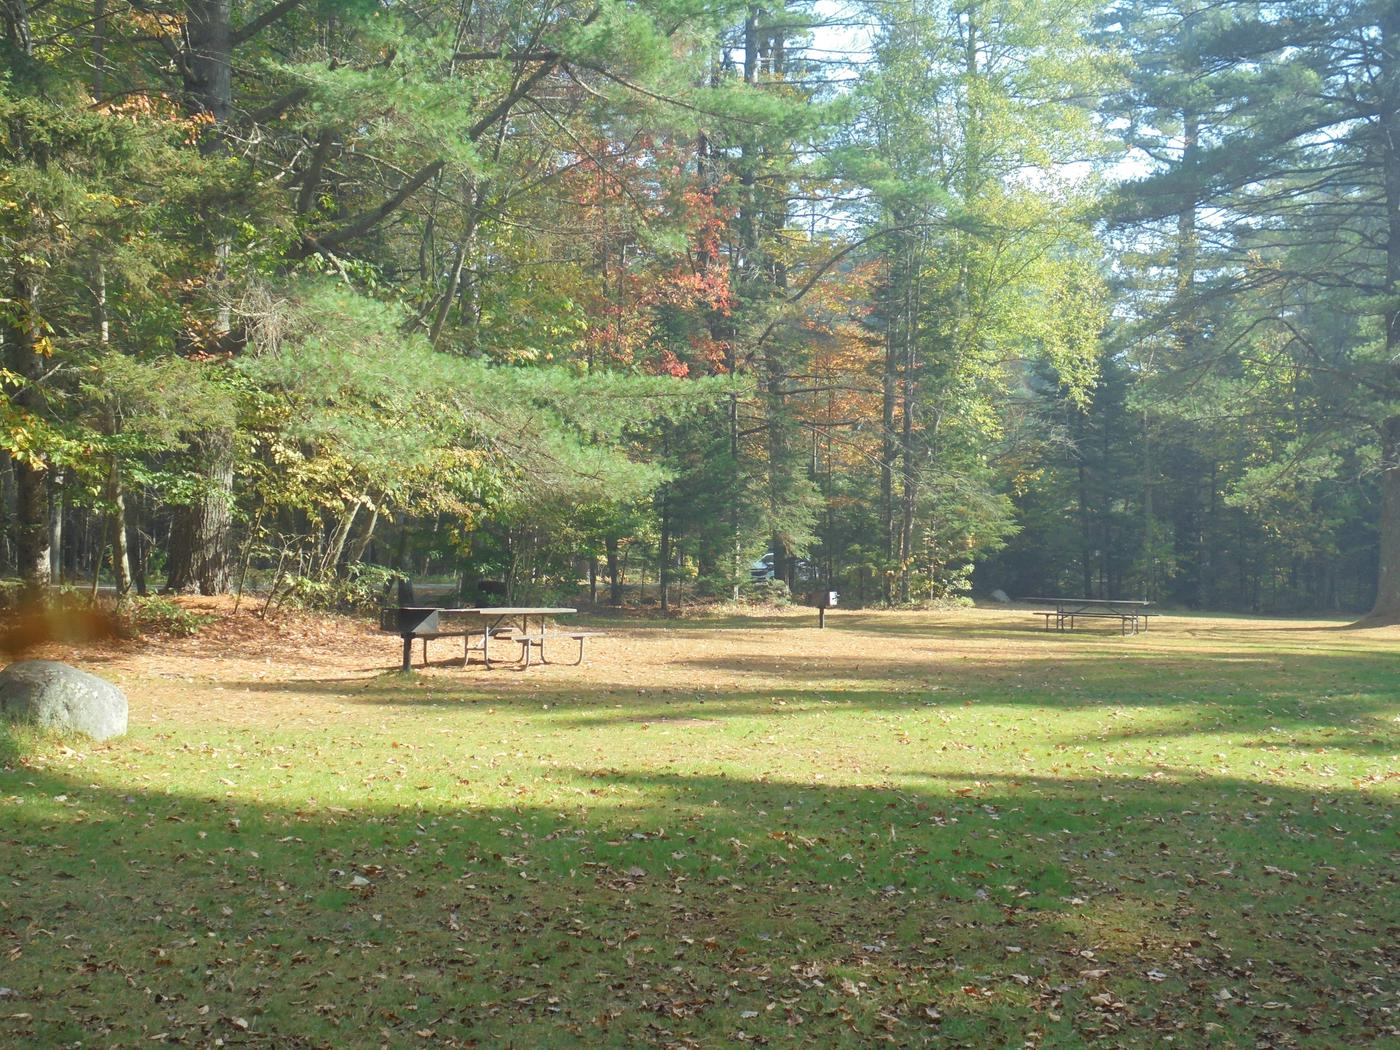 Wildwood Day Use Area (2)